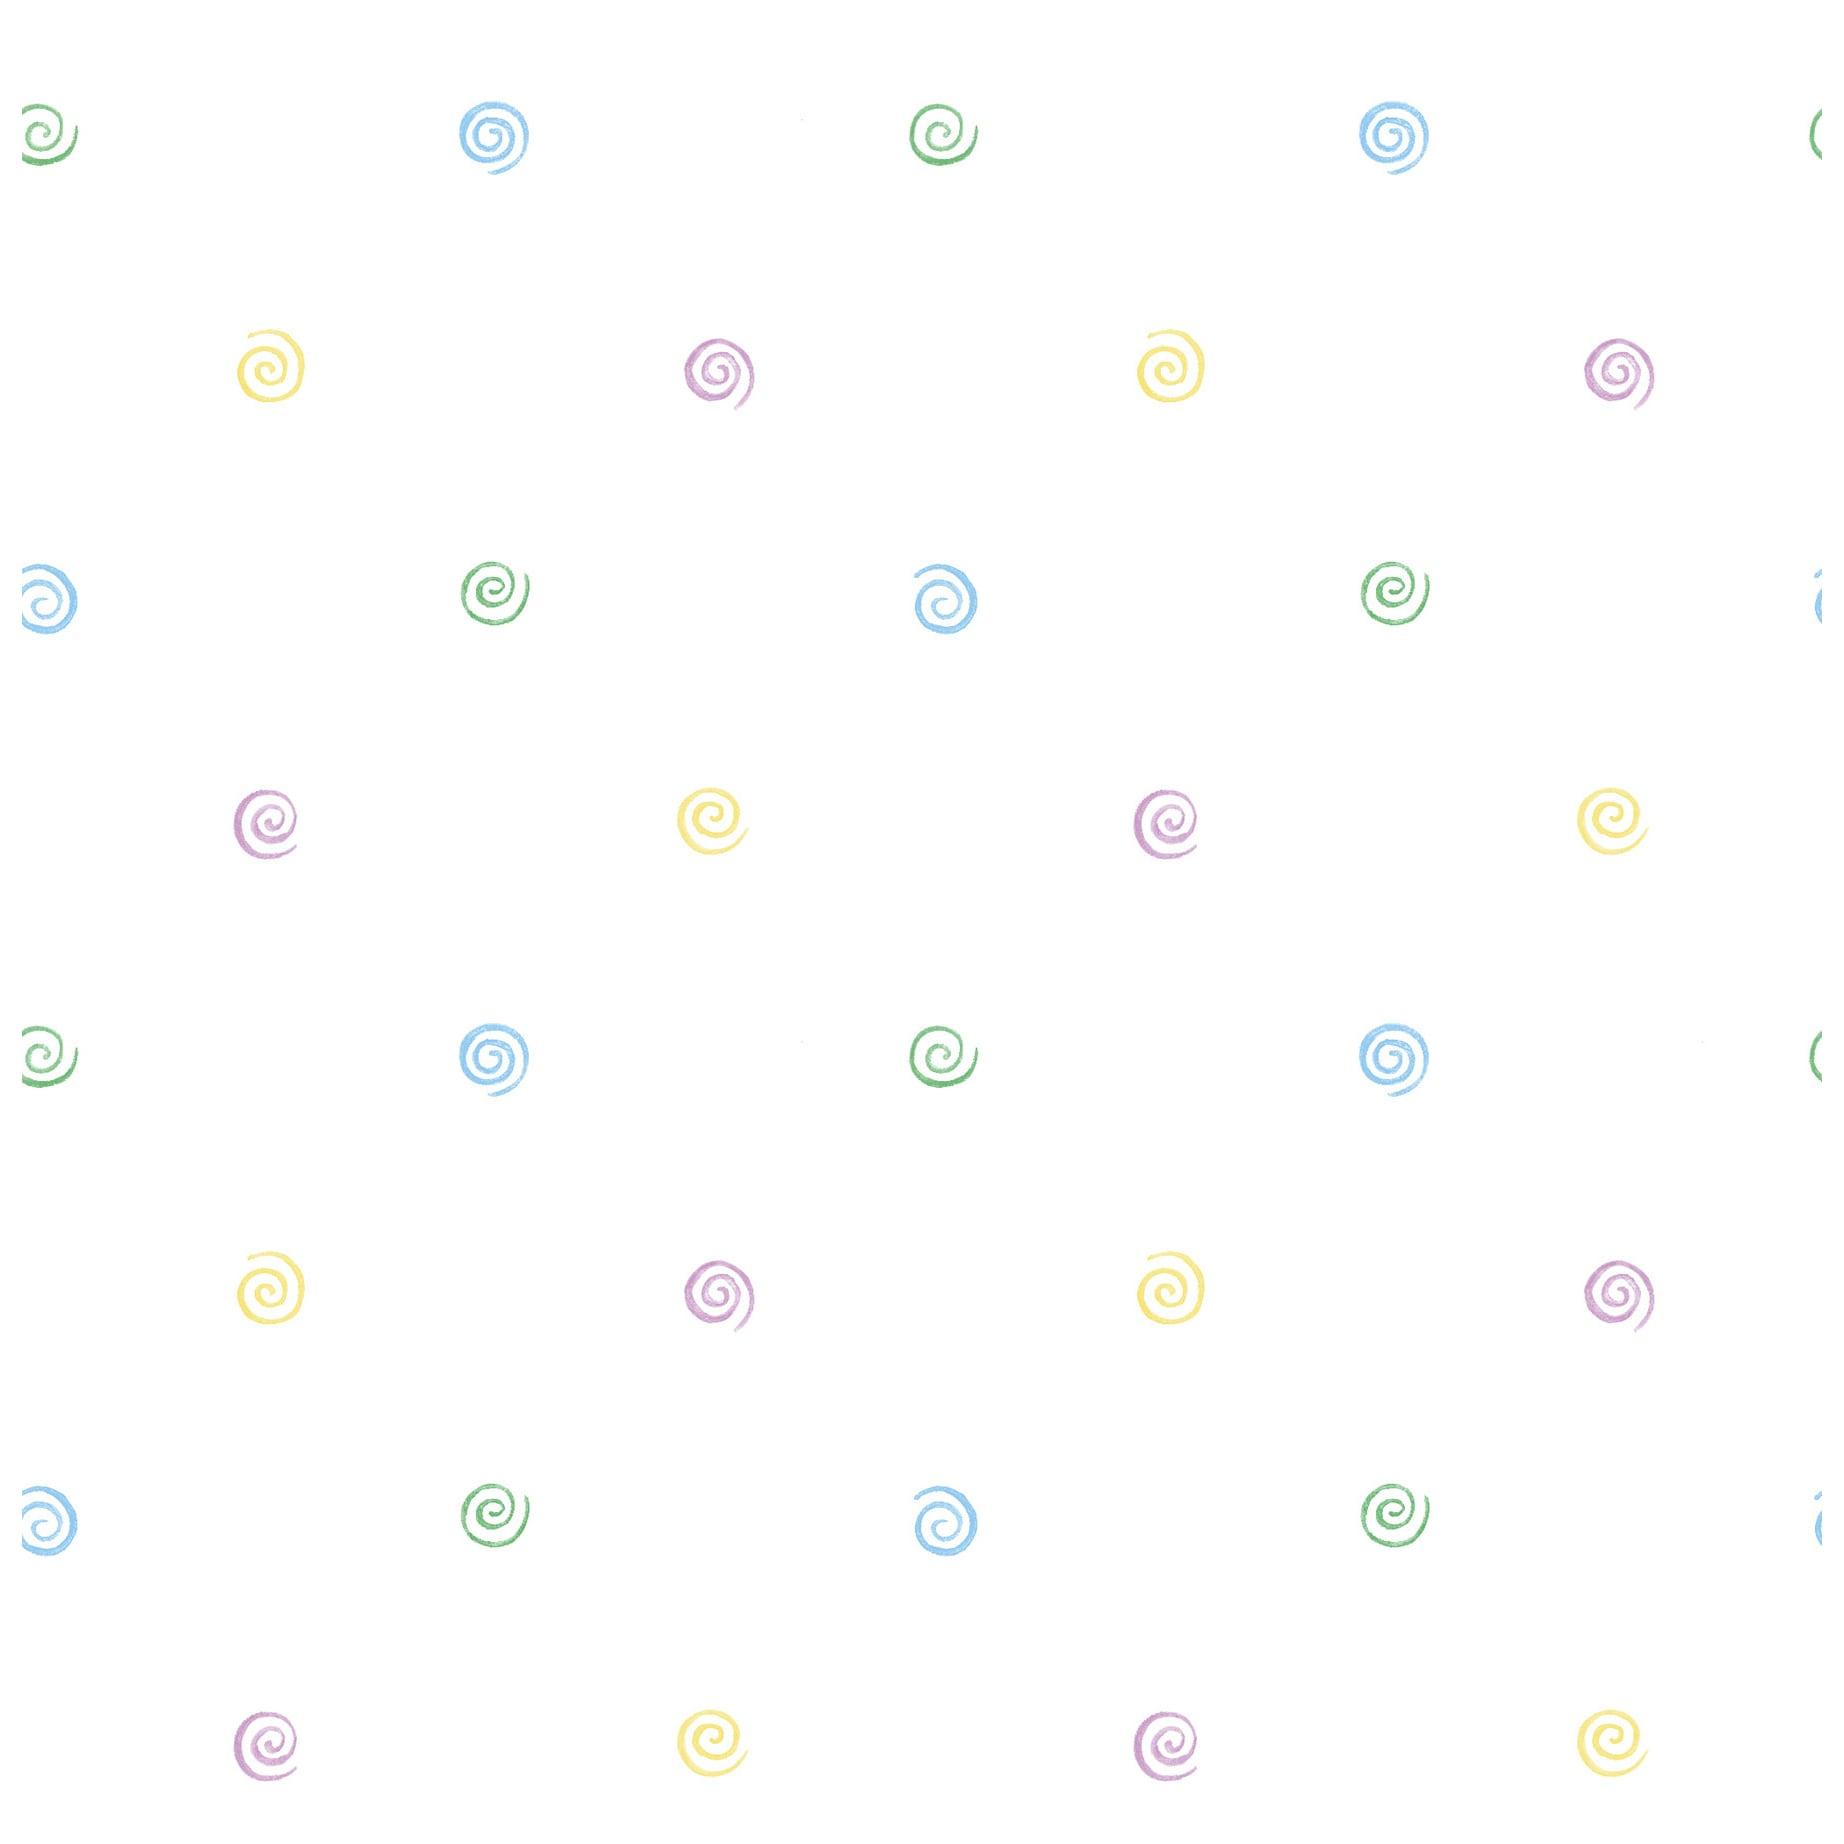 Brewster Purple/Blue/White Polka Dot Wallpaper (Purple Po...